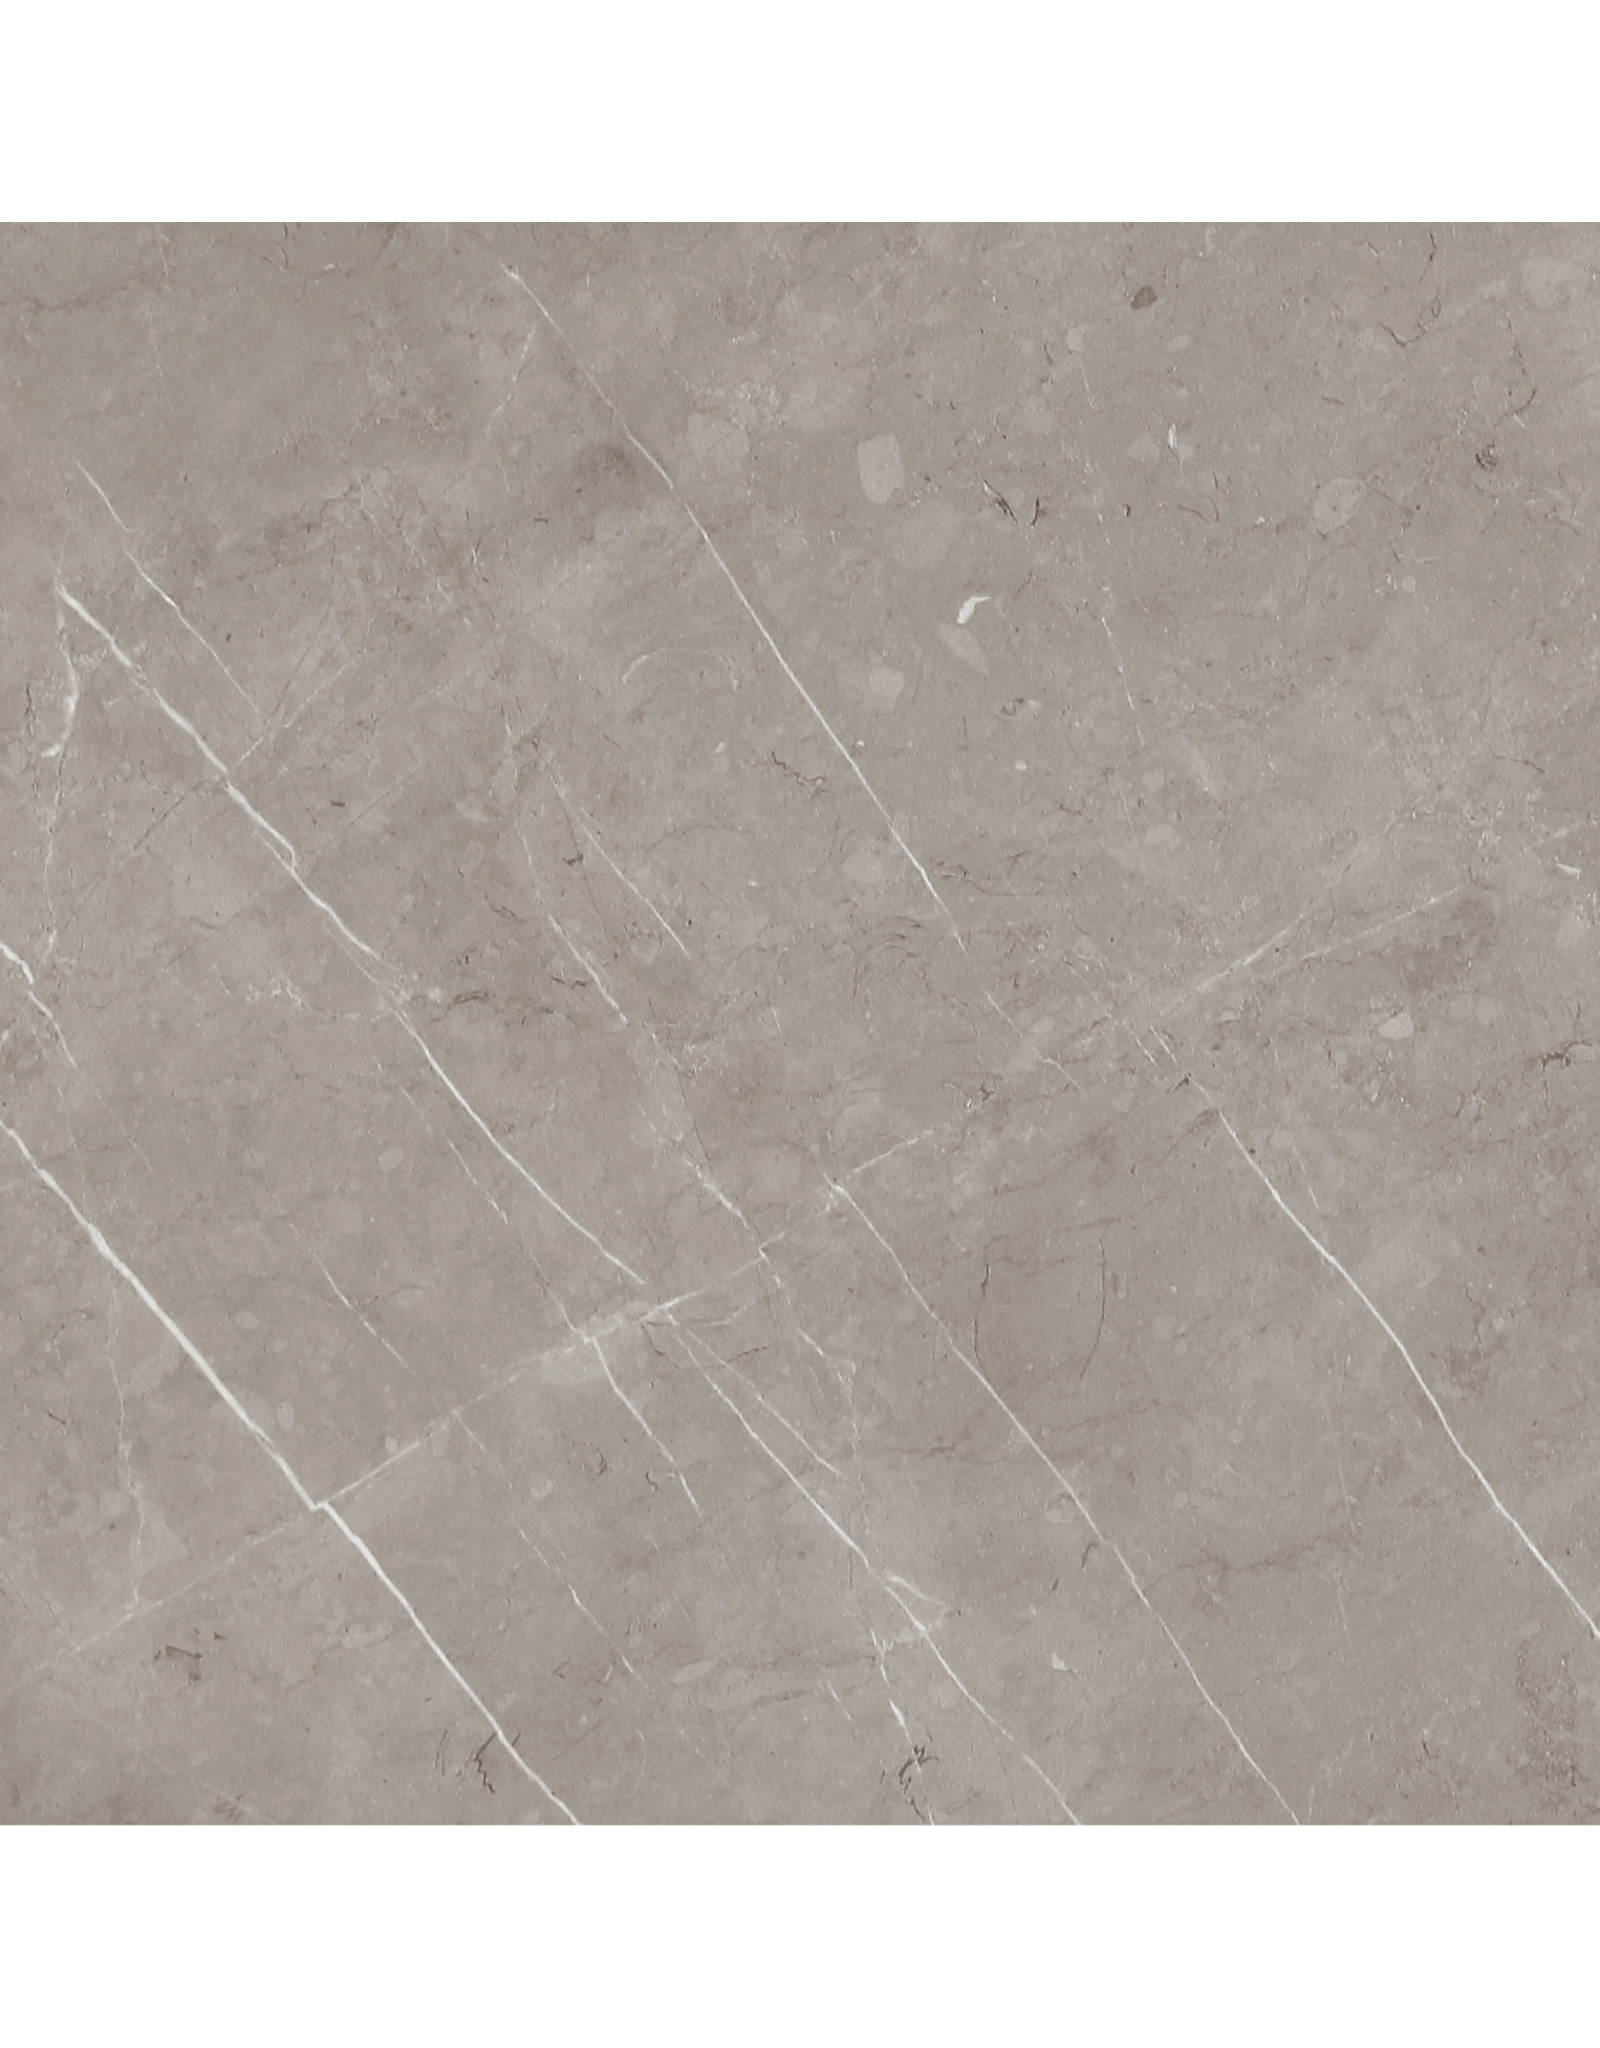 Eternity Tiles 600x600, Lava Kraka Matt Finish Floor and Wall Tile, Price Per Piece